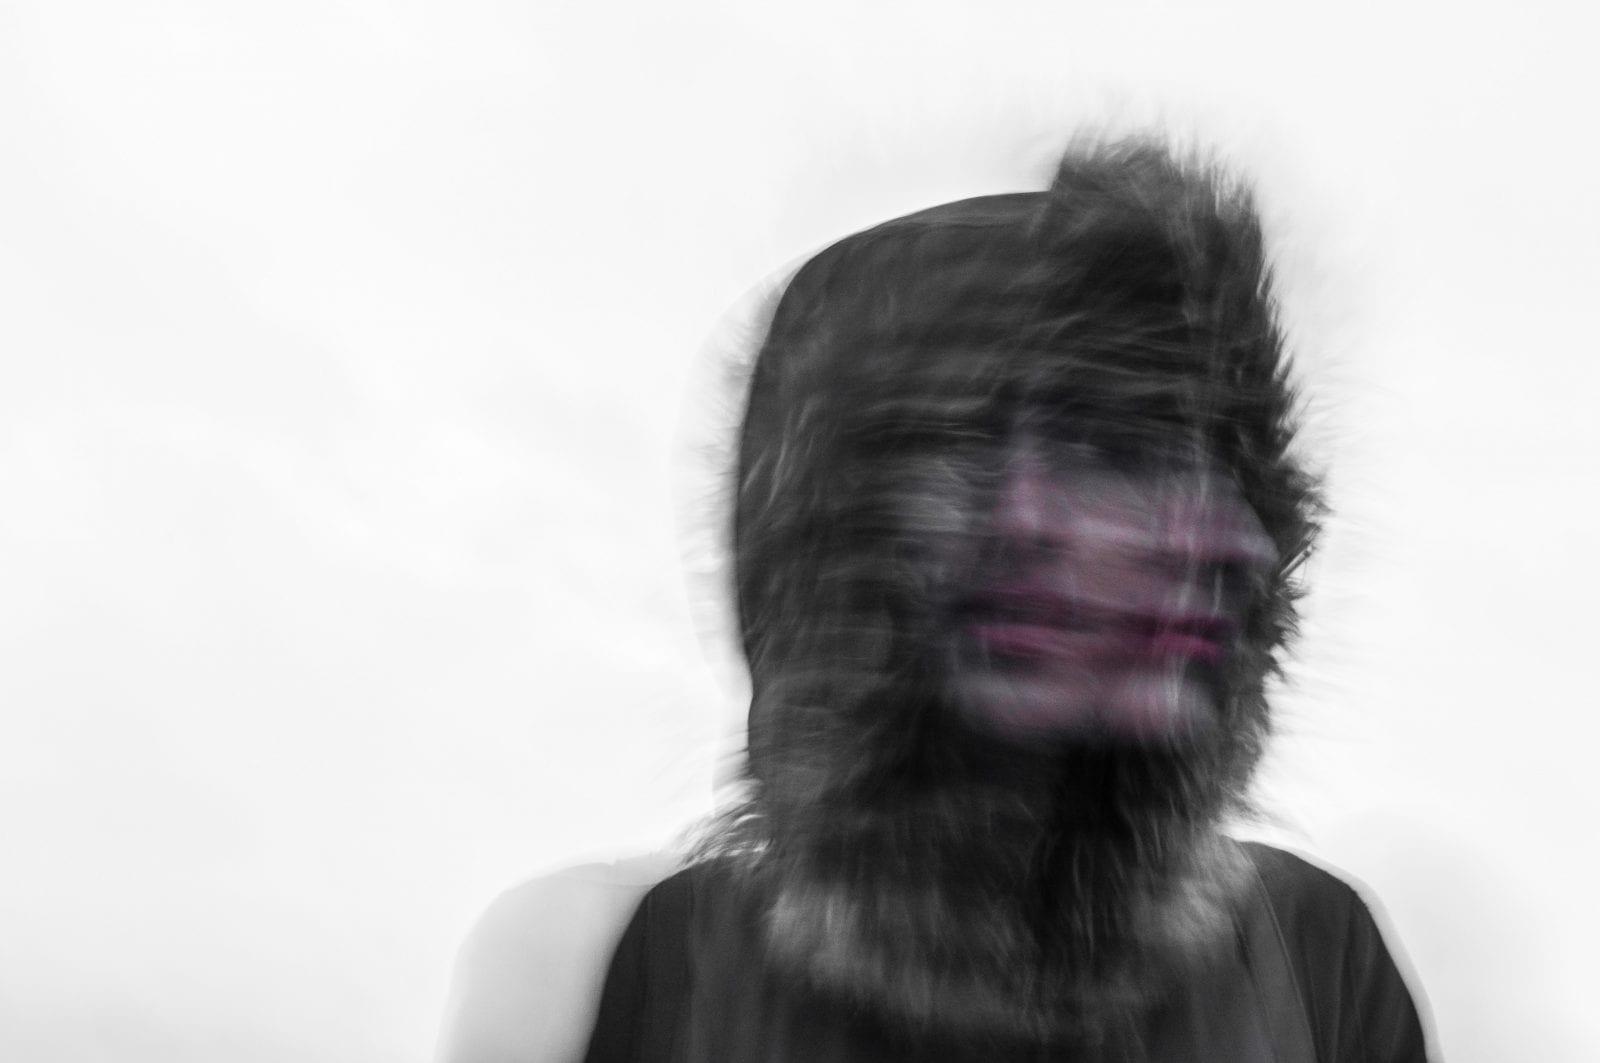 Beneficios de asistir a terapia psicológica imagen